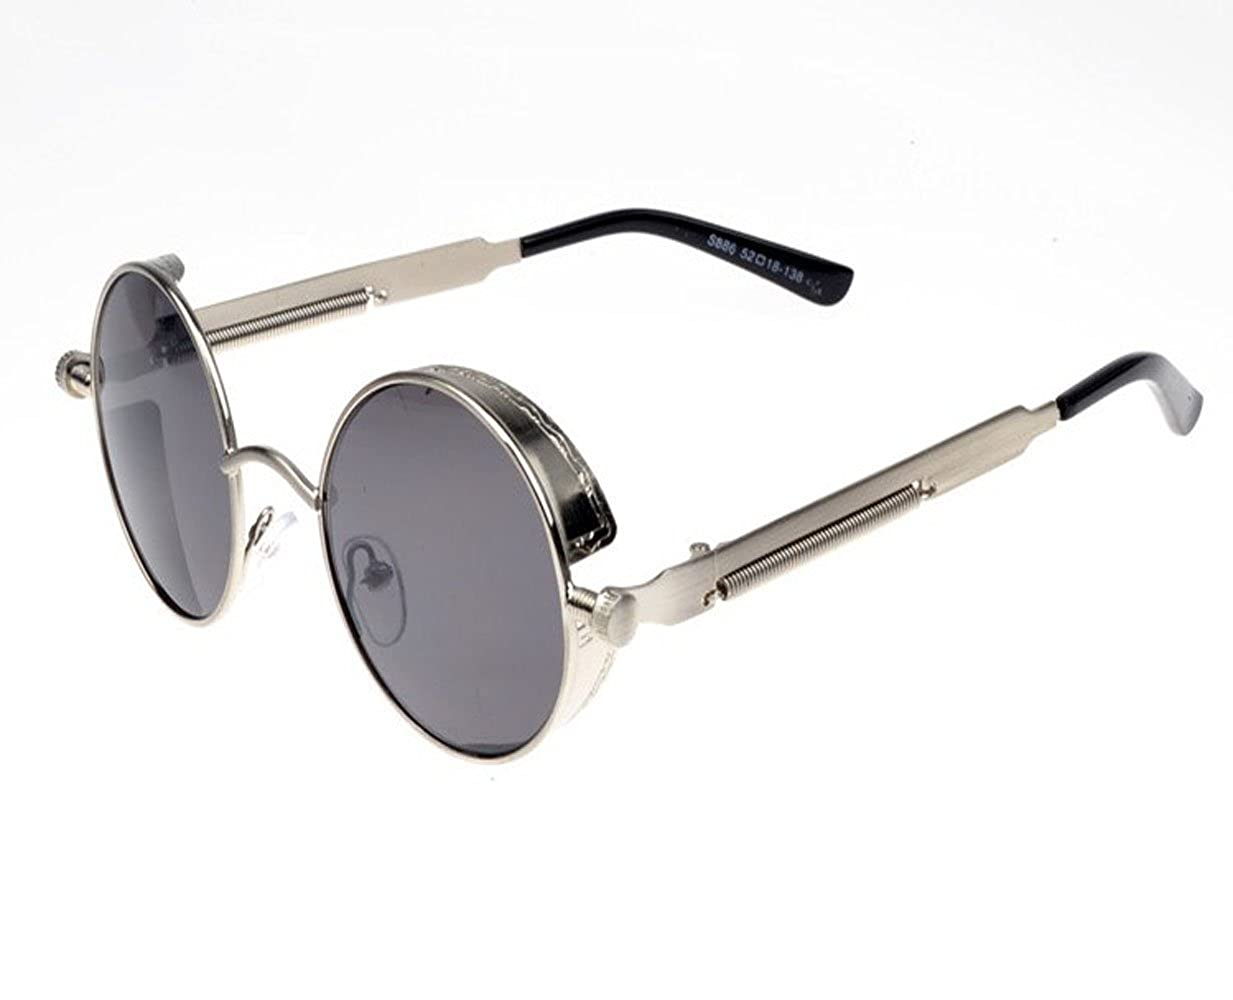 51ce90d3d13 Amazon.com  TELAM Retro Round Sunglasses Men Women Prince Mirror Sunglasses   Shoes